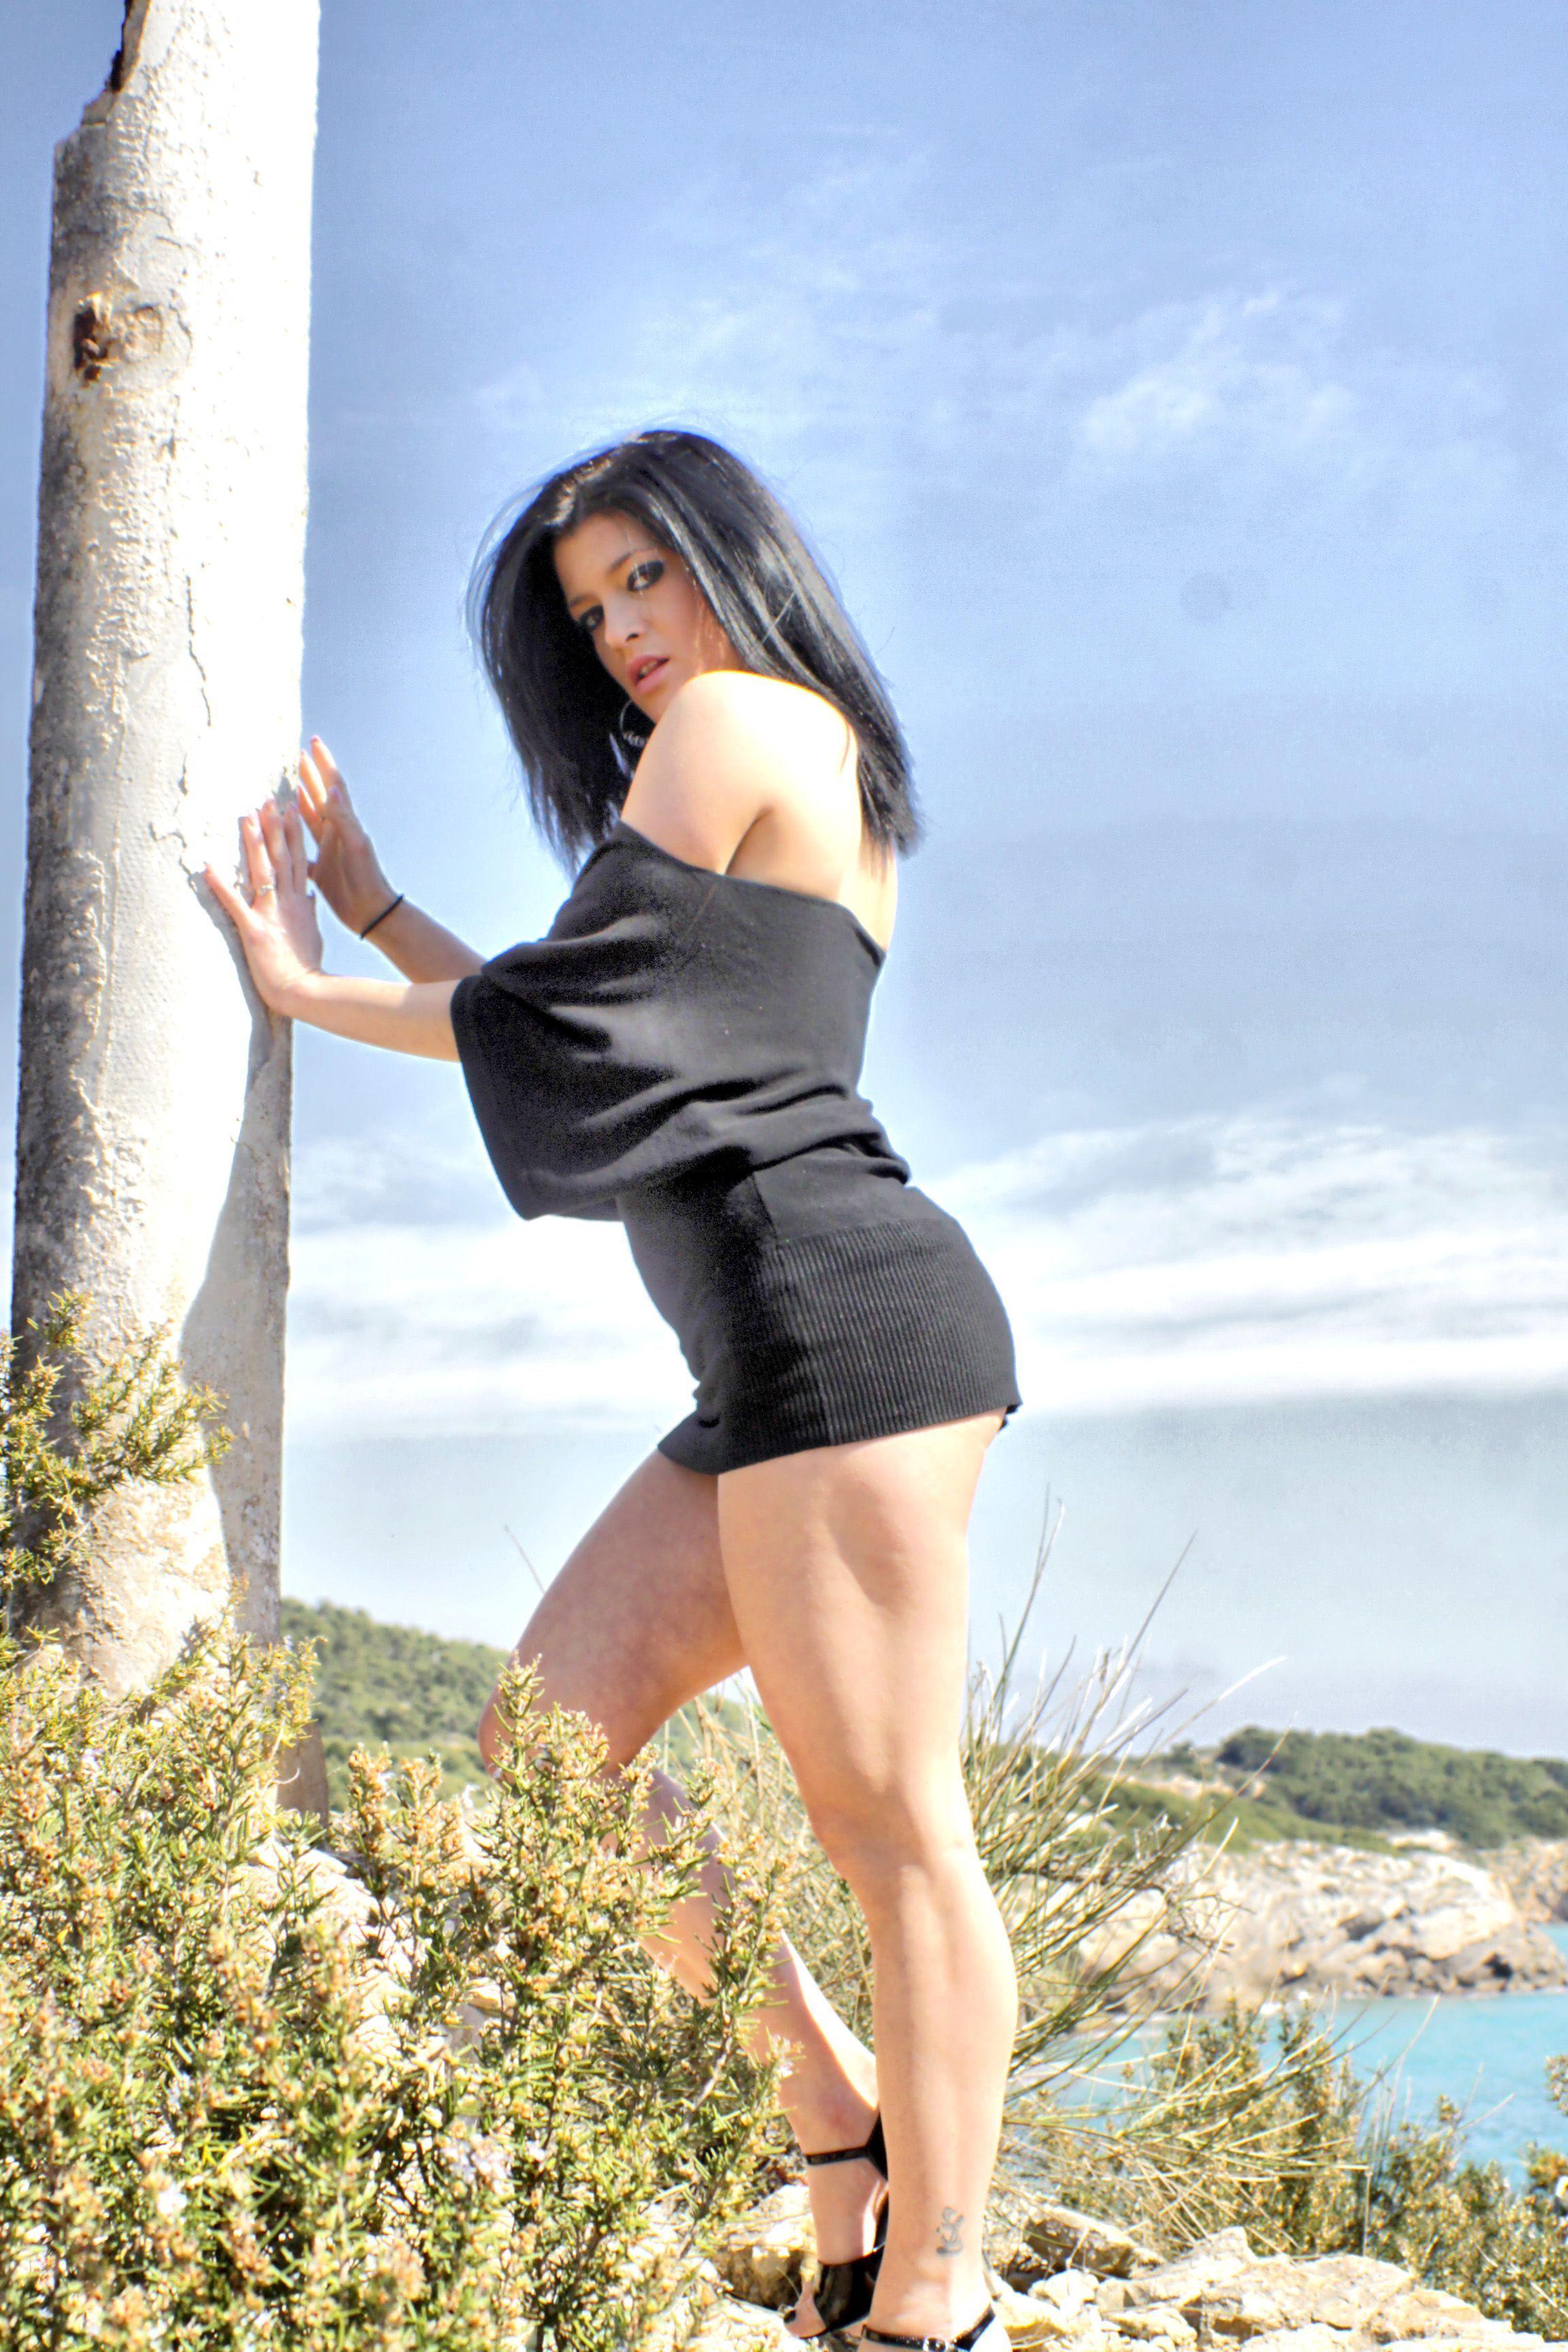 Lana Fevers